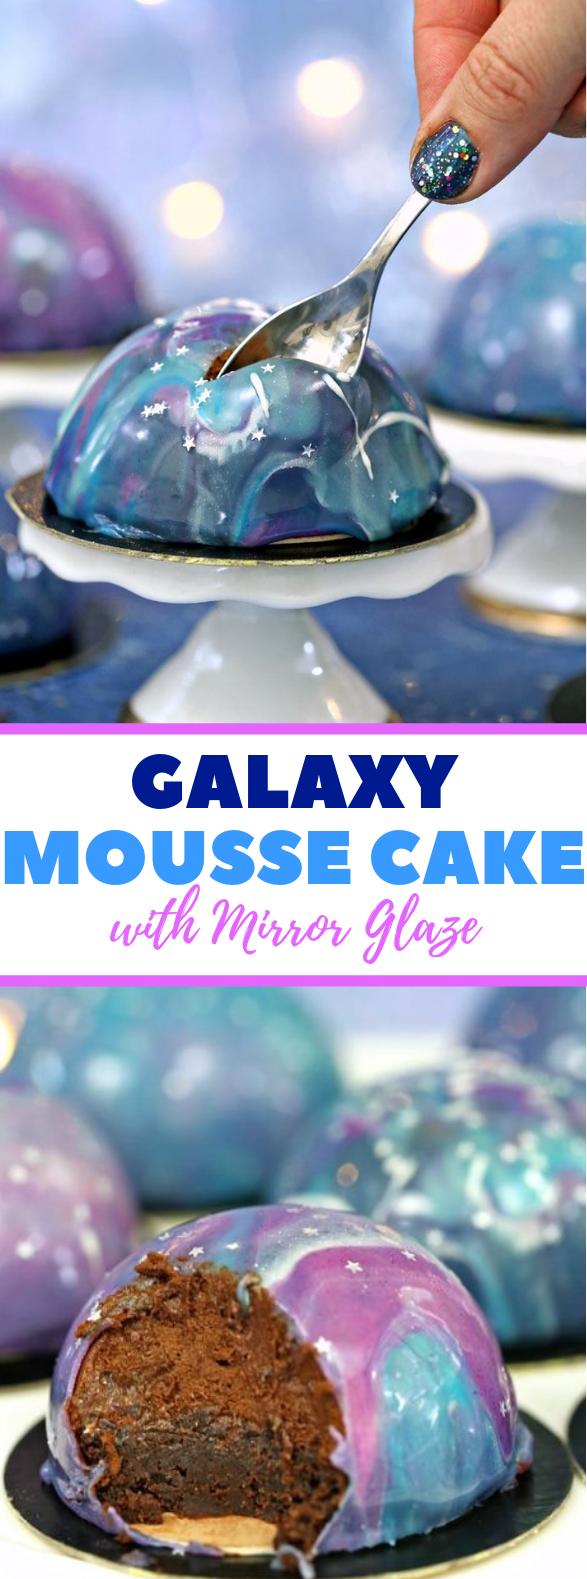 GALAXY MOUSSE CAKES WITH MIRROR GLAZE #dessert #bestrecipe